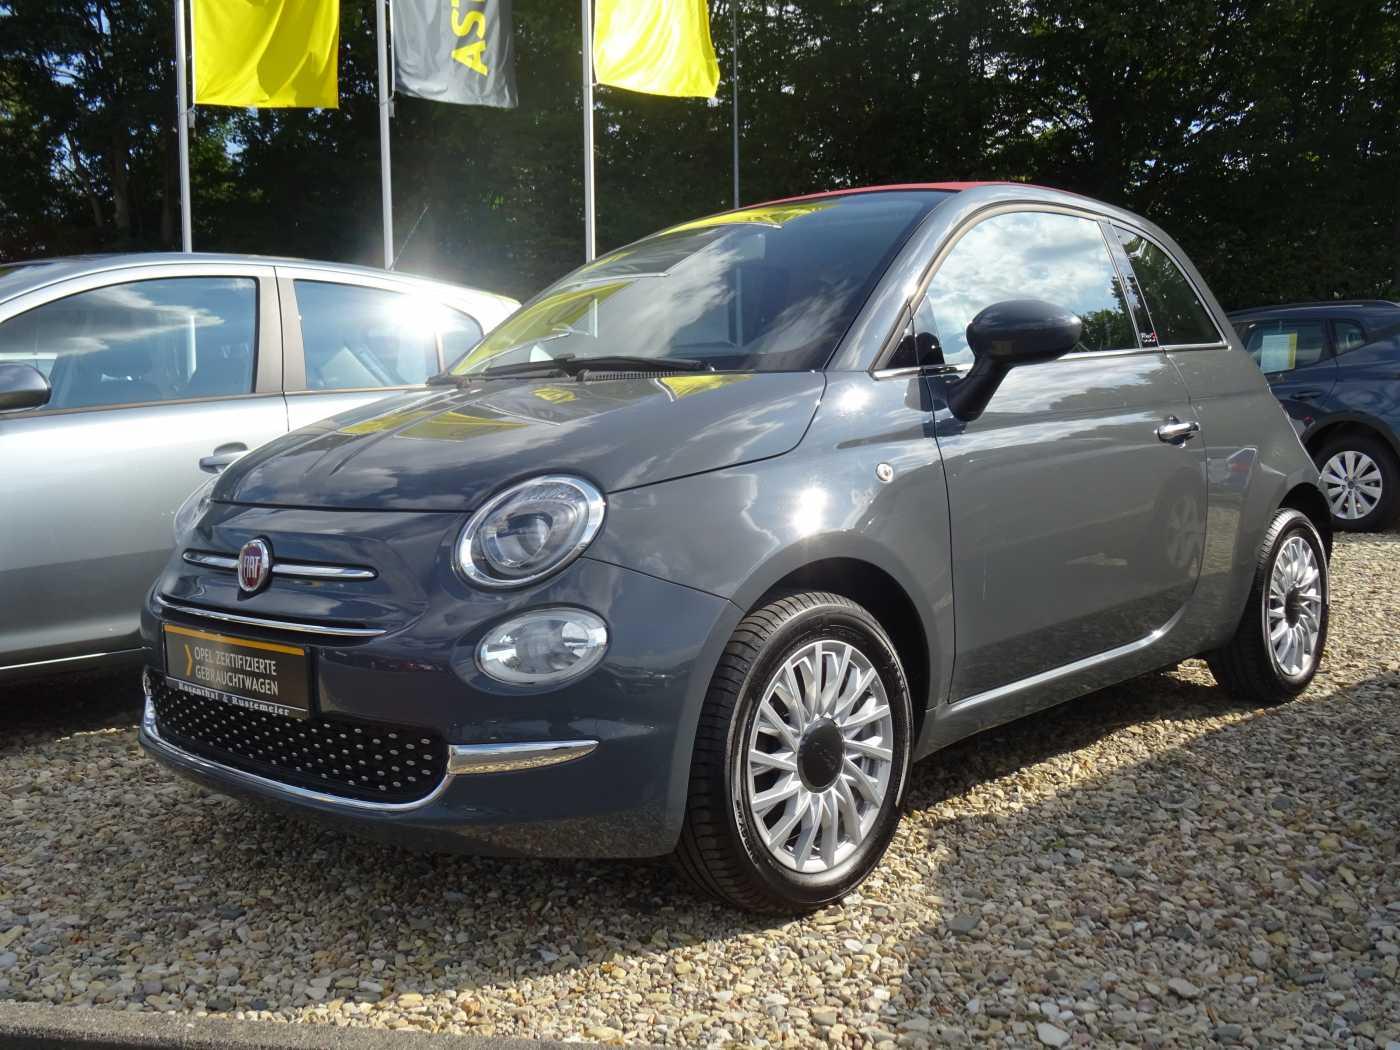 Fiat 500C 1.3 Multijet Lounge BLUETOOTH AUDIOSTREAMING, Jahr 2017, Diesel